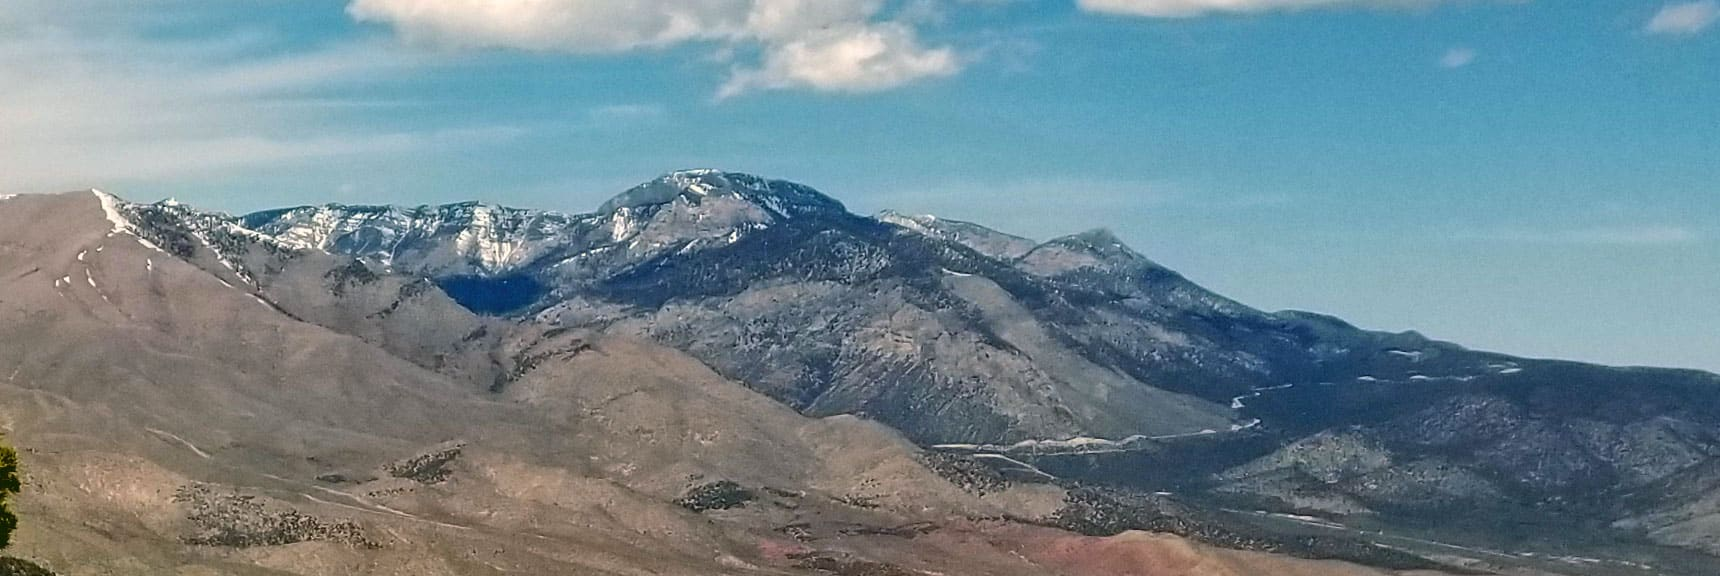 Fletcher Peak (center) Viewed from La Madre Mountain: Mummy Mt. in Background.